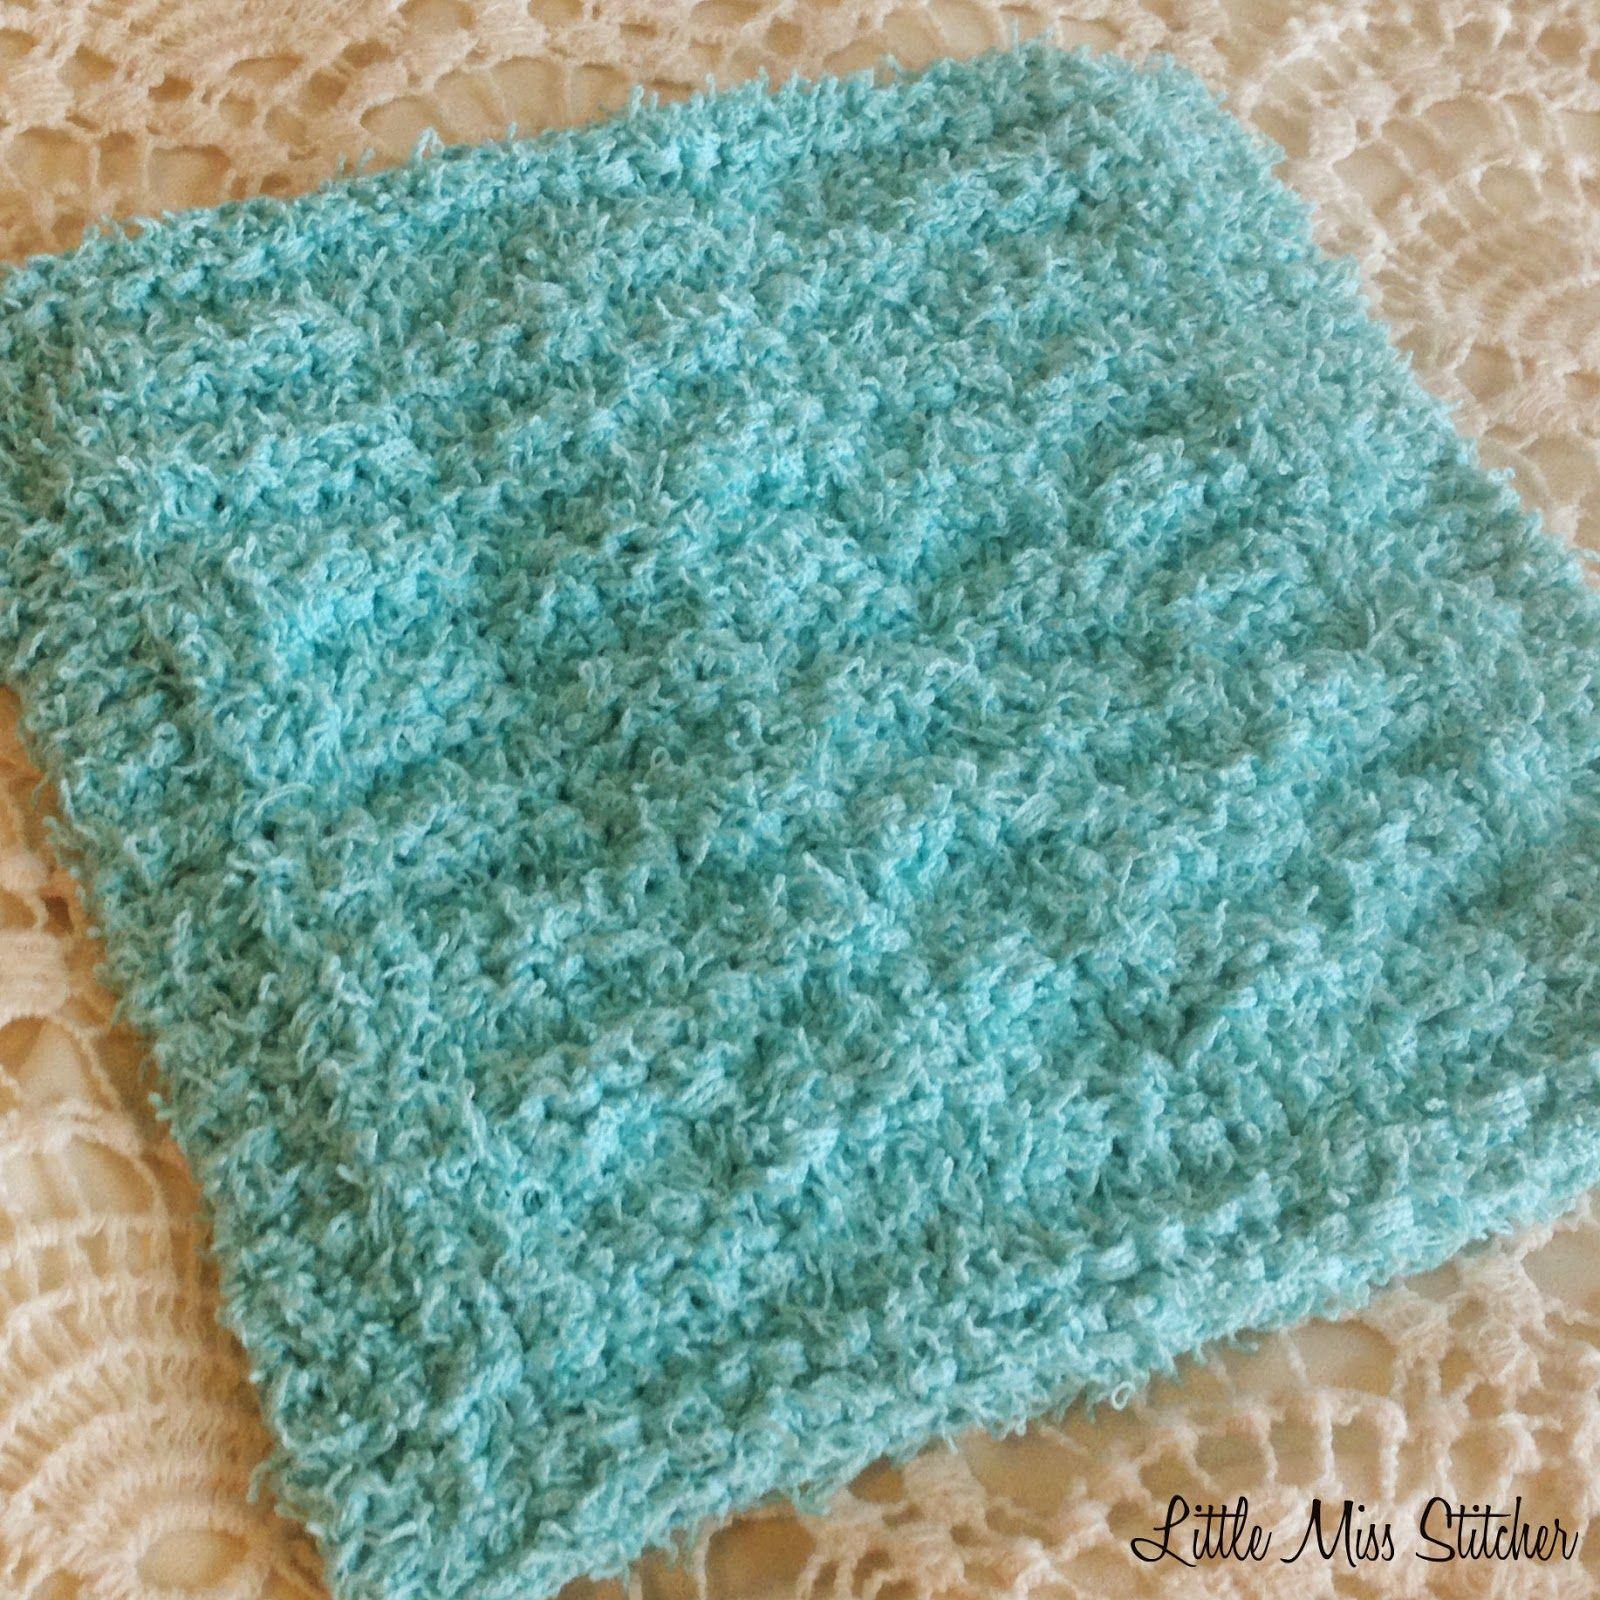 Little miss stitcher scrubby dishcloth pattern dishcloth little miss stitcher scrubby dishcloth pattern bankloansurffo Gallery